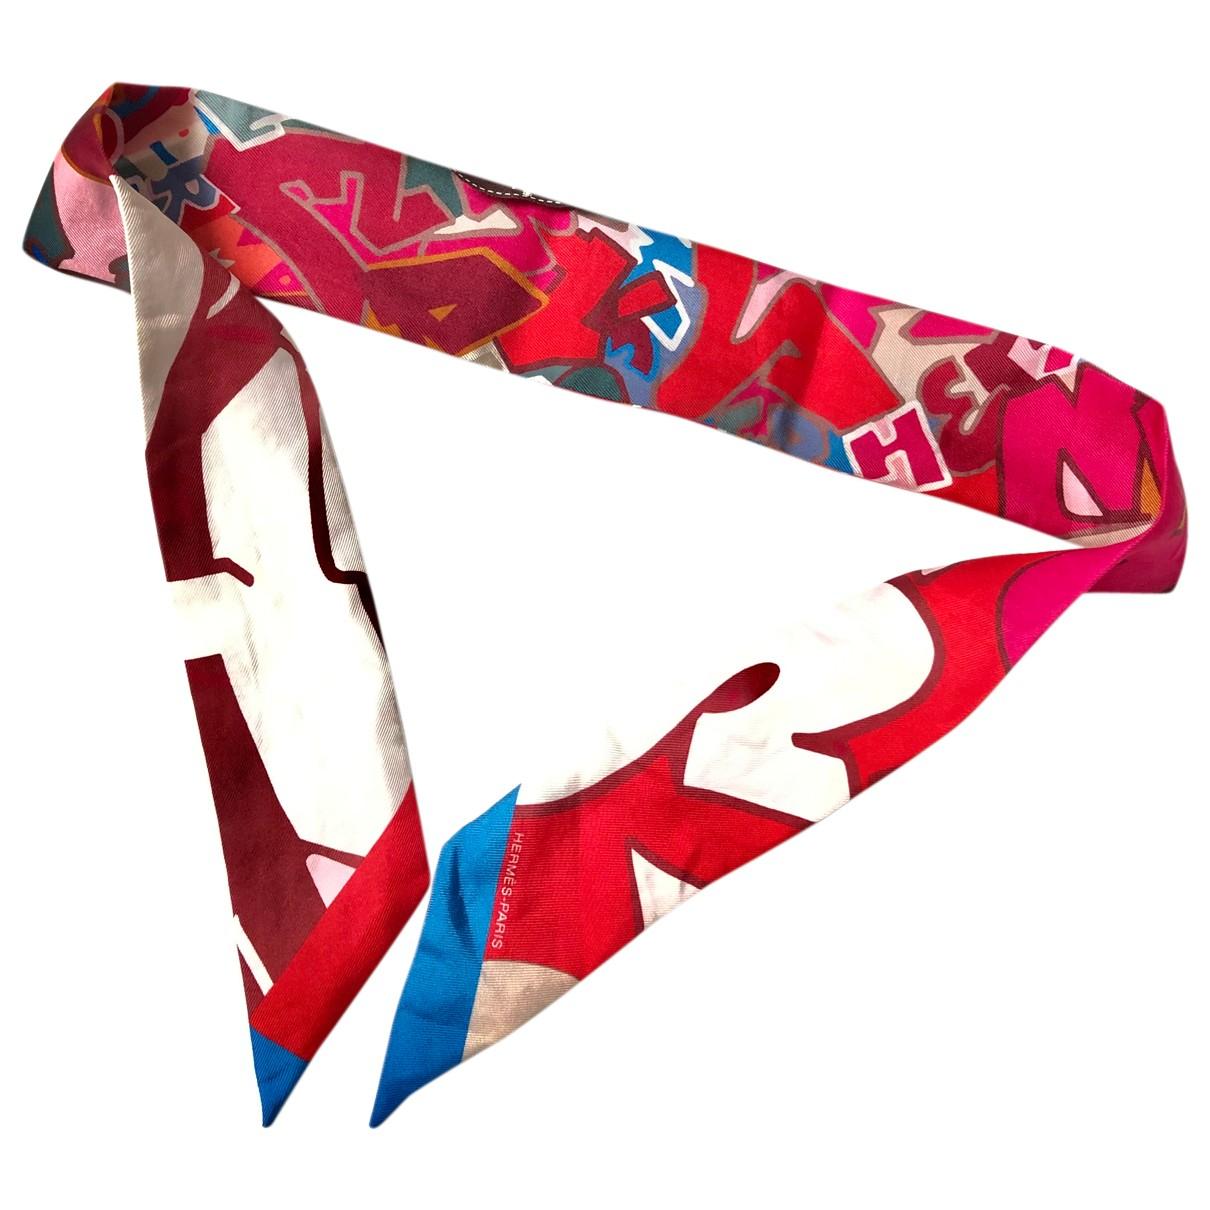 Hermes - Foulard Twilly 86 pour femme en soie - rouge